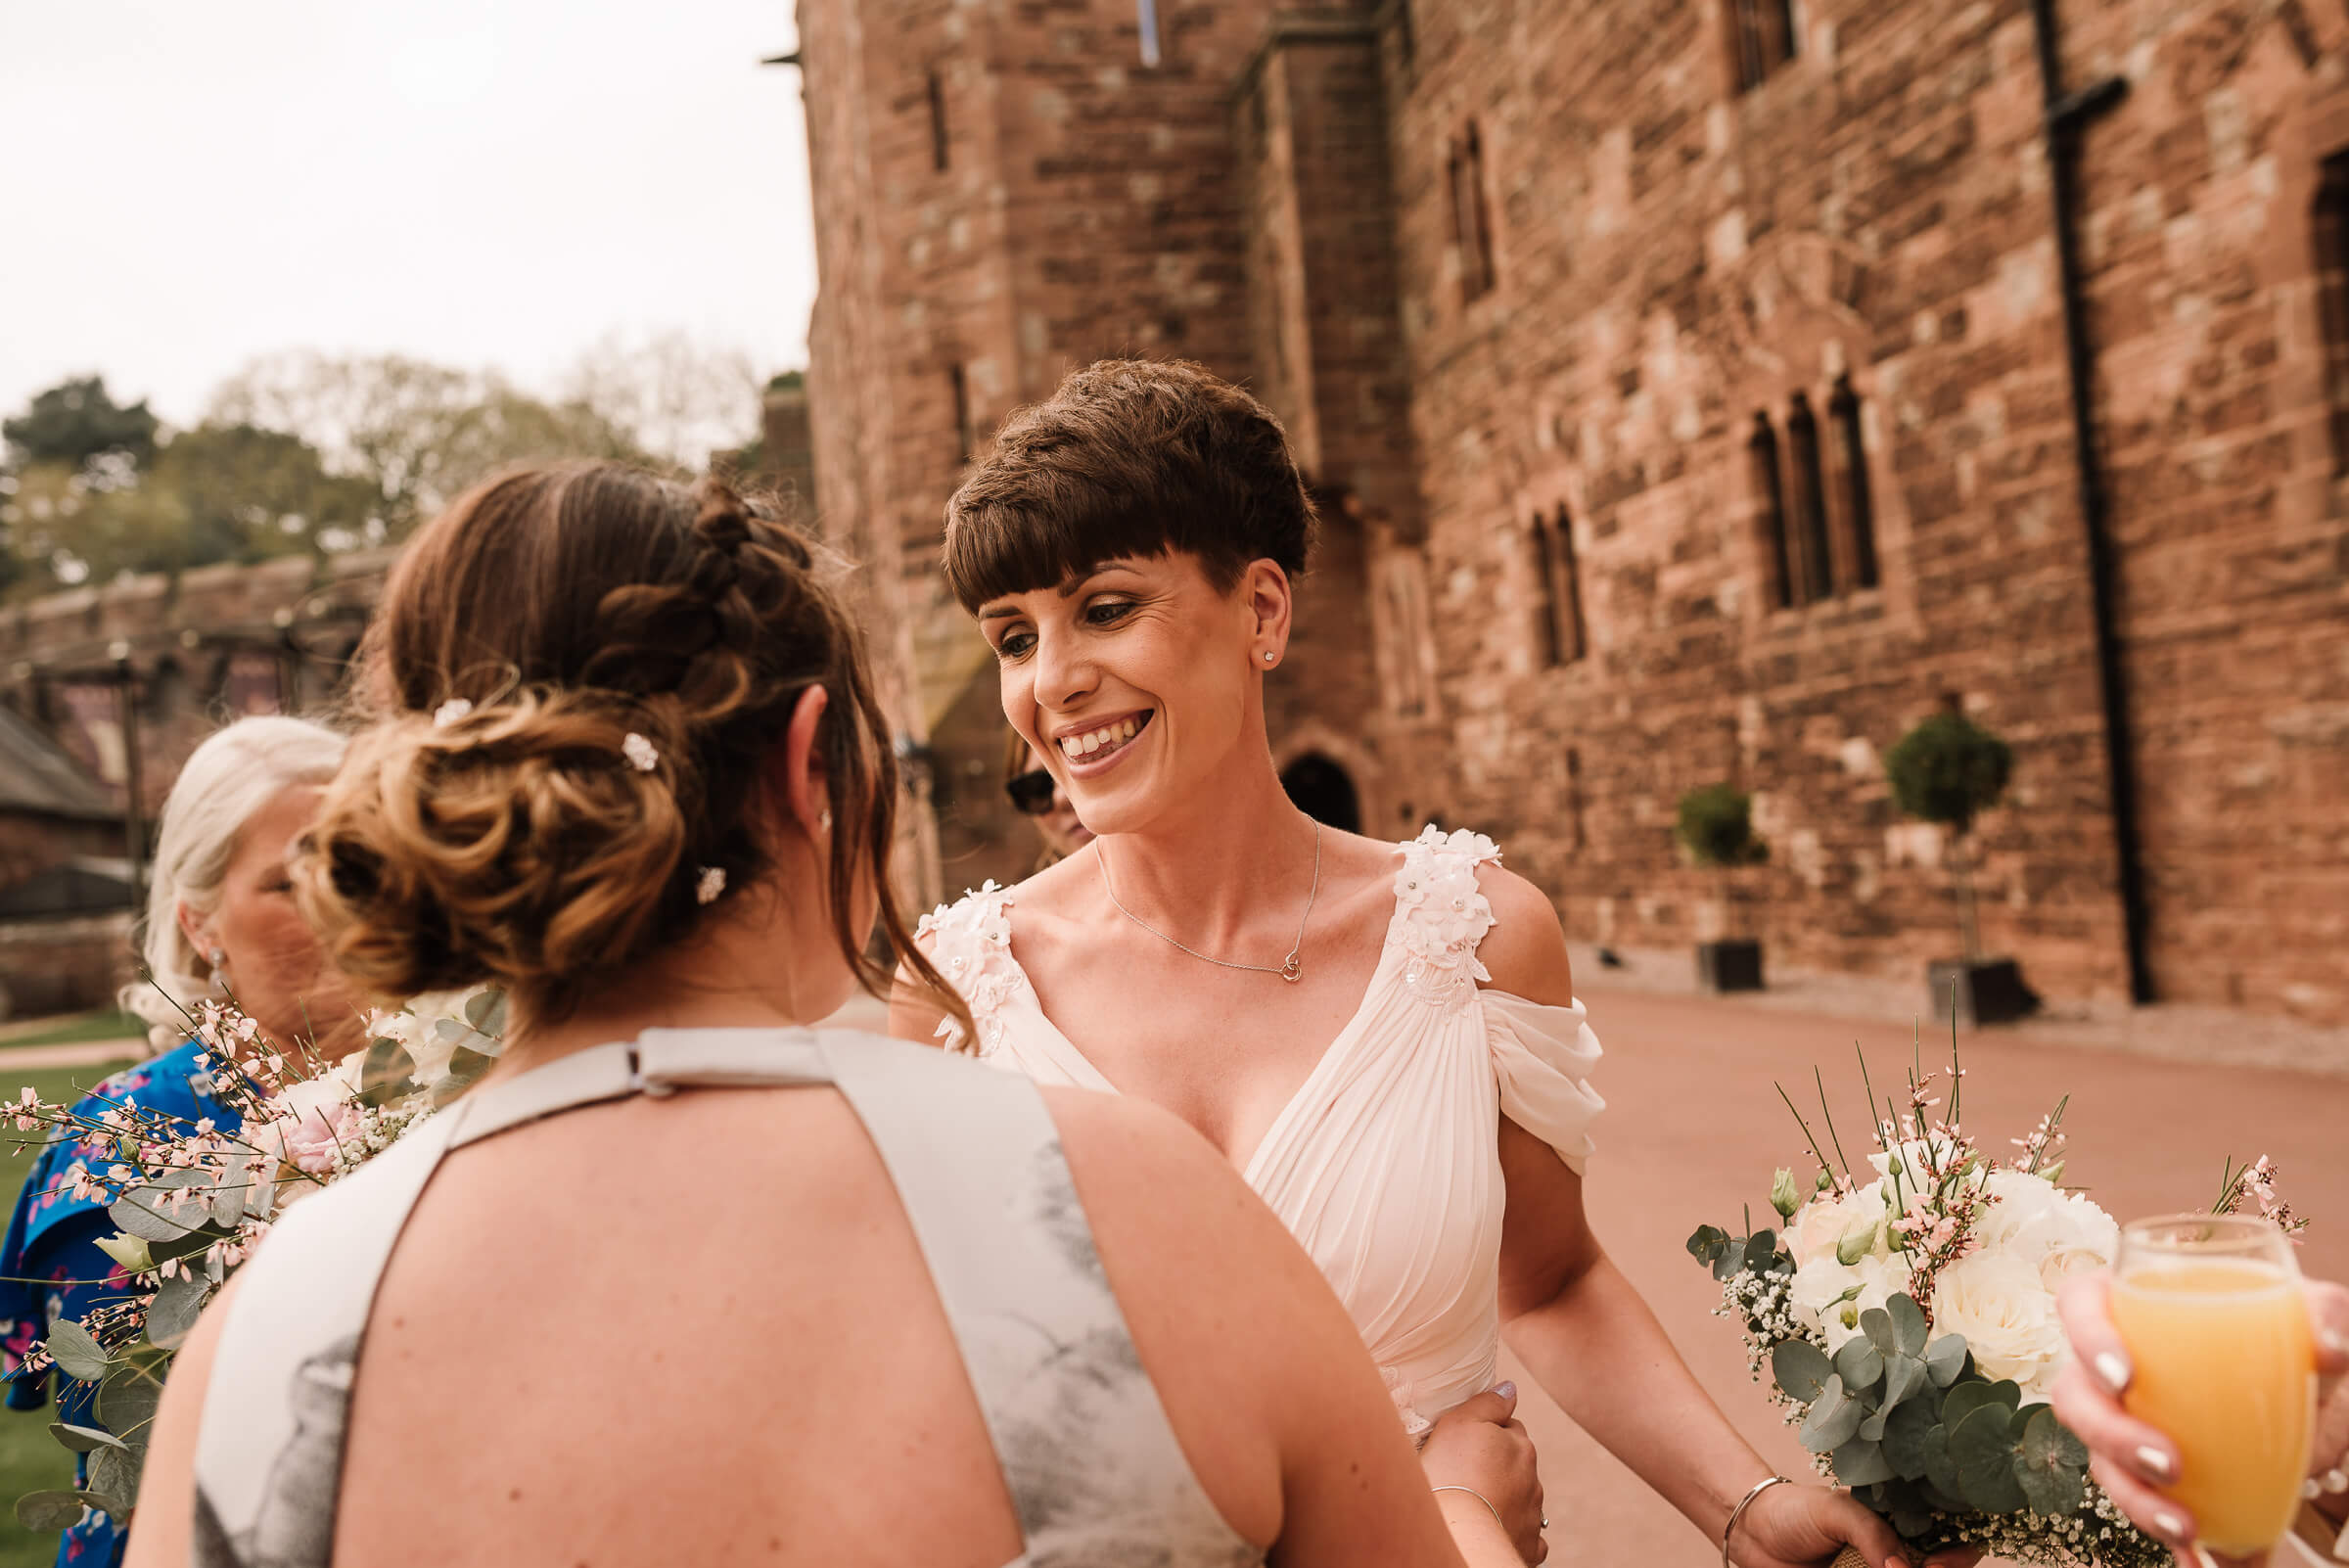 brides sister and bridemaid smiling